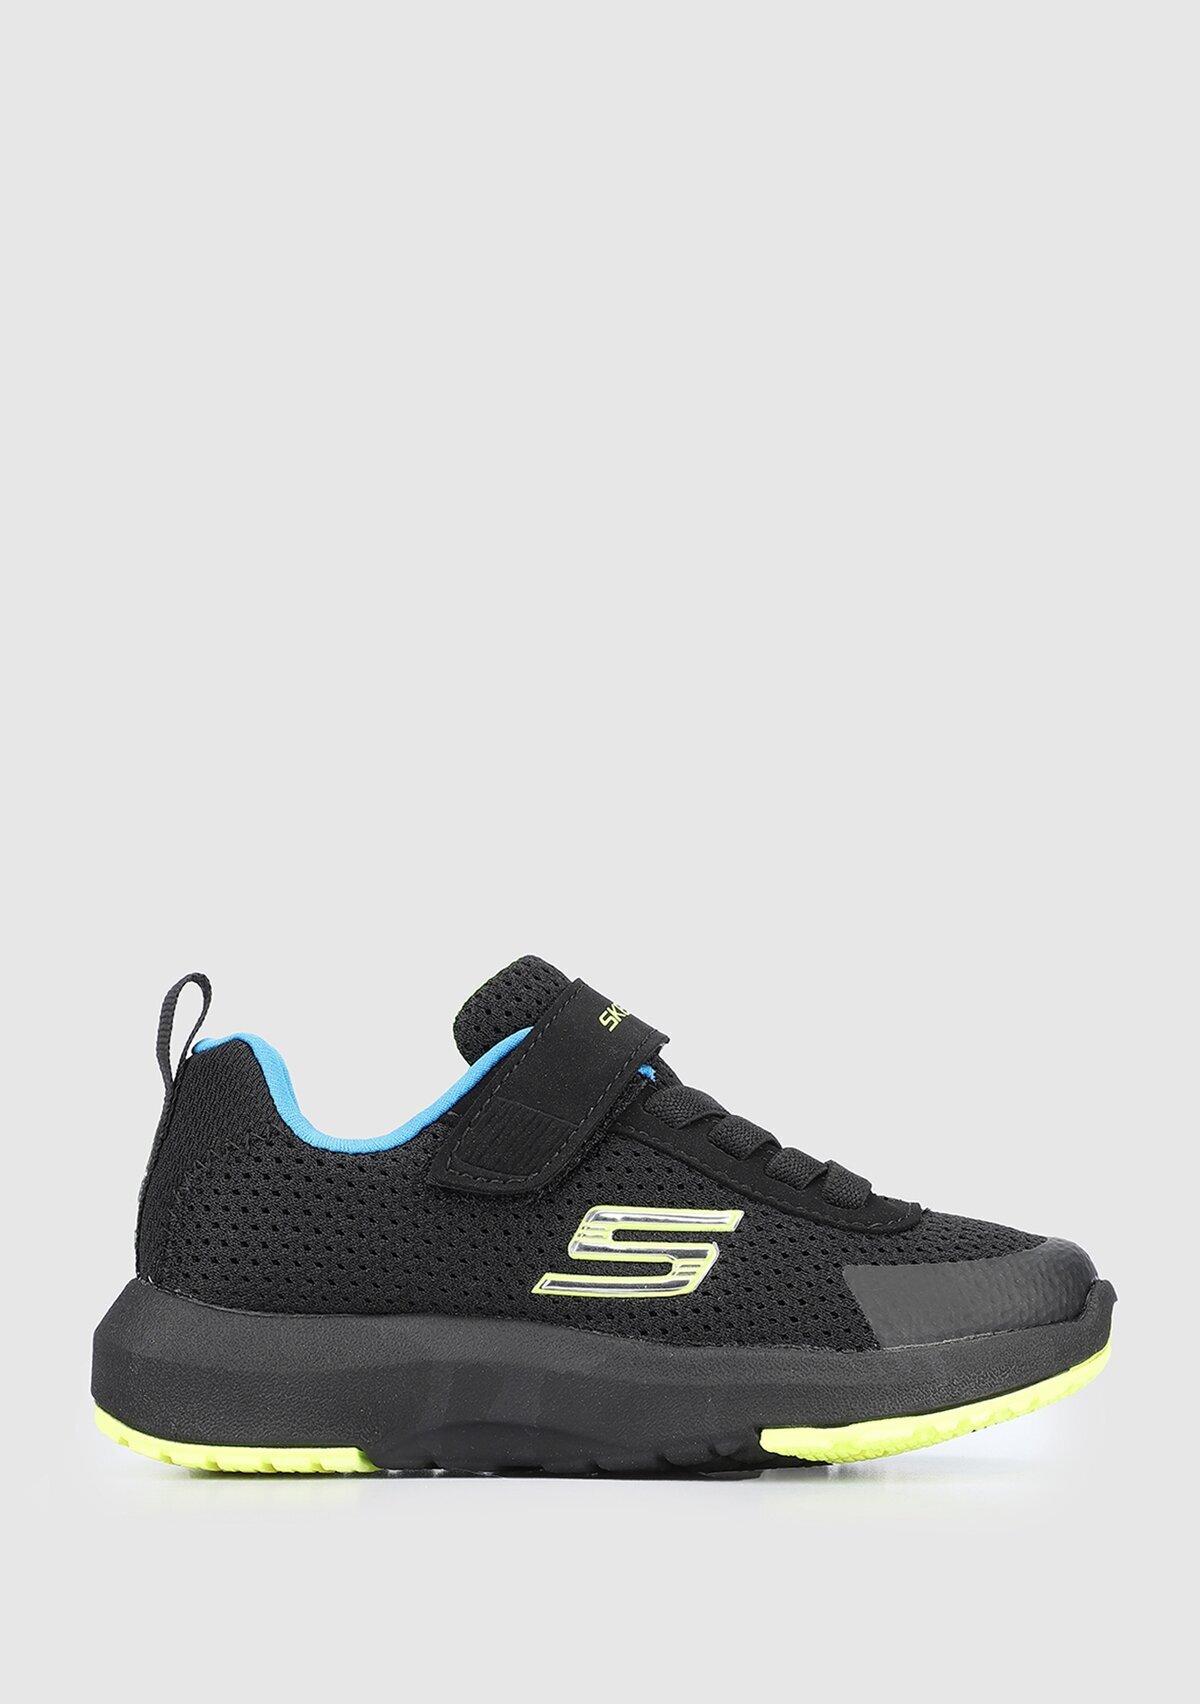 resm Dynamight Tread Siyah Erkek Çocuk Sneaker 98151L B